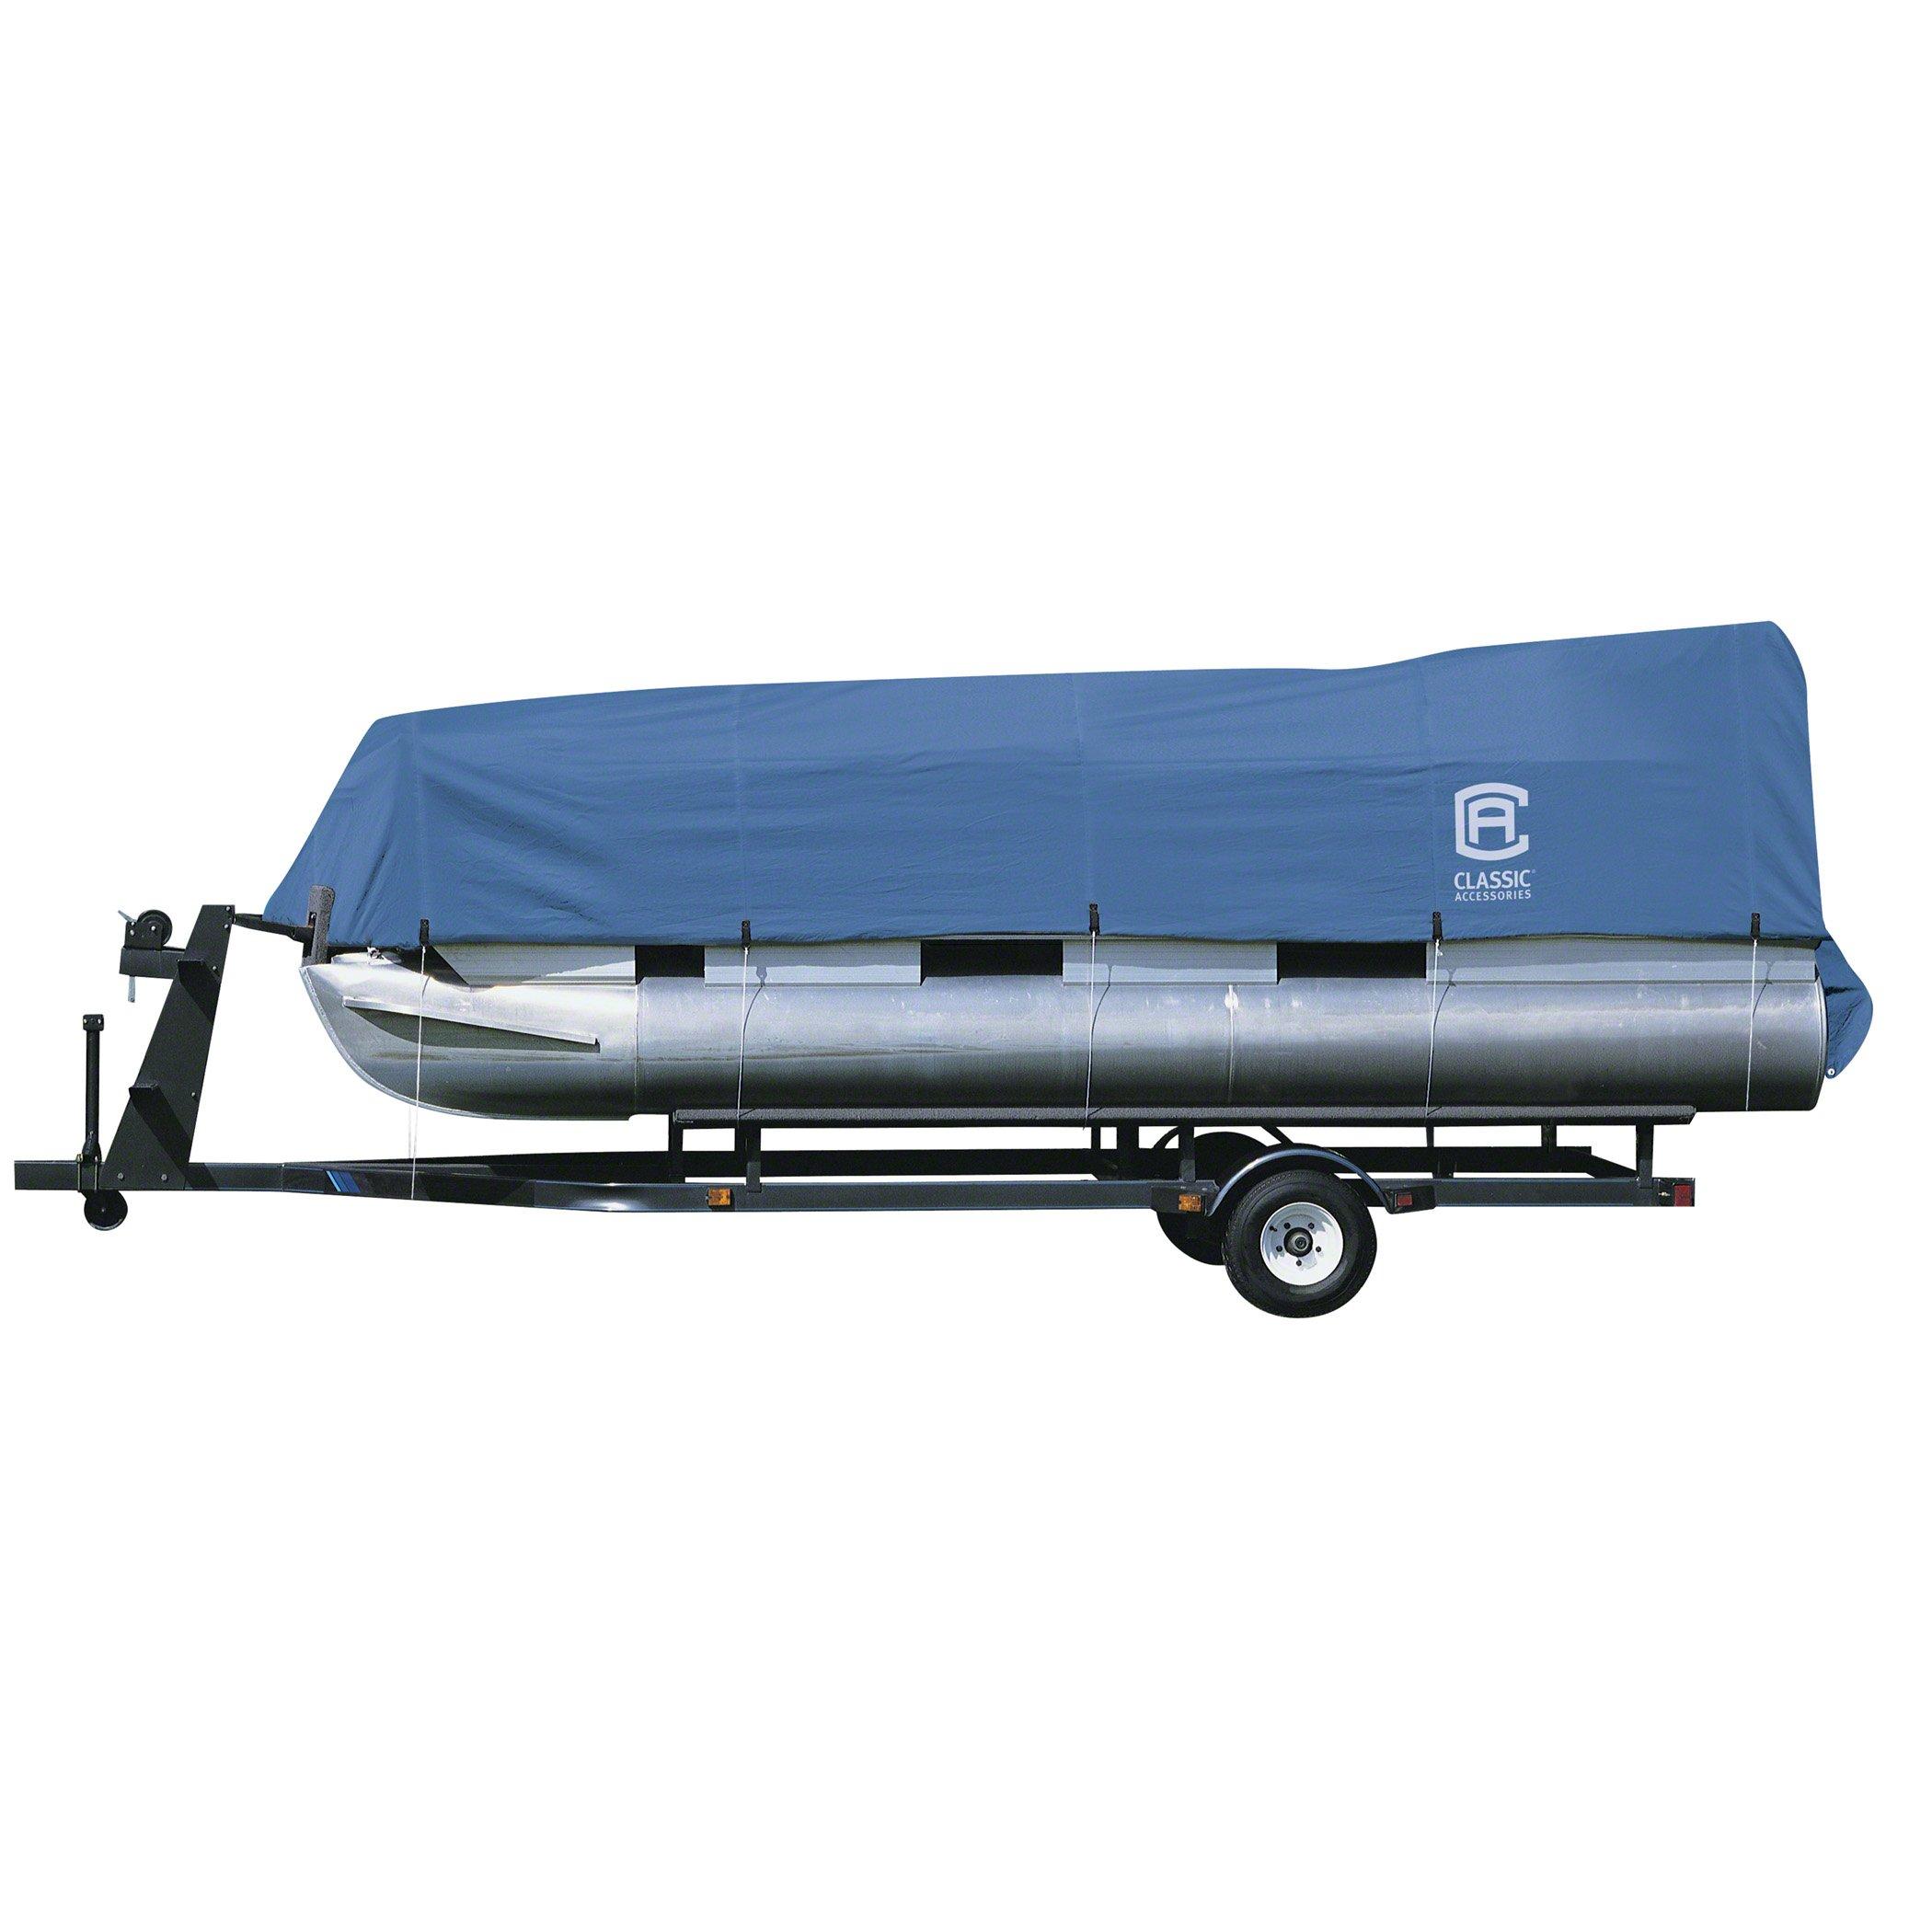 Classic Accessories Stellex Boat Cover For Pontoon Boats, Fits 17' - 20' L x 102'' W by Classic Accessories